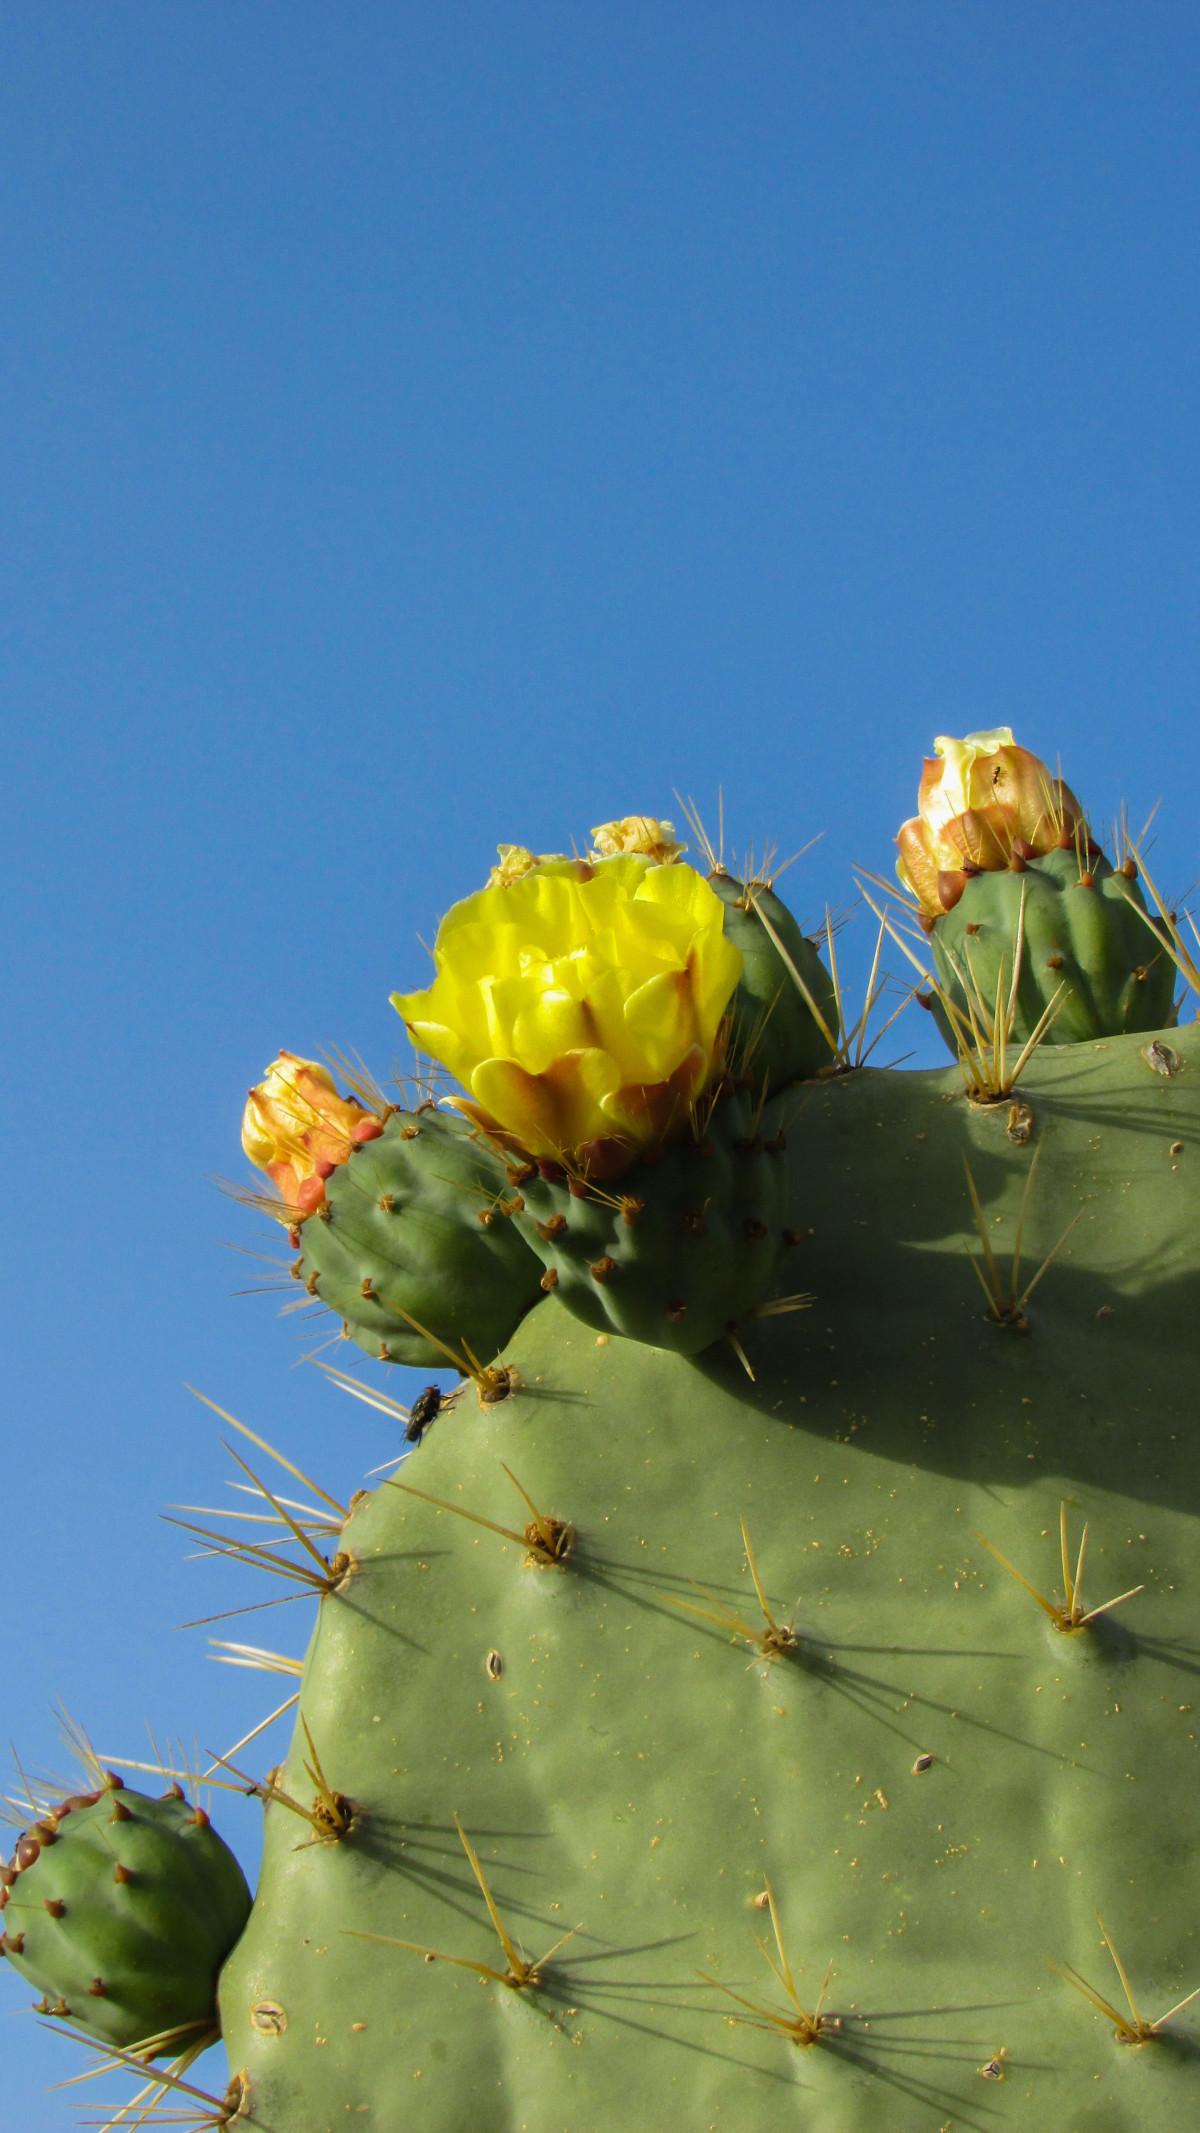 kostenlose foto baum natur kaktus scharf blume. Black Bedroom Furniture Sets. Home Design Ideas